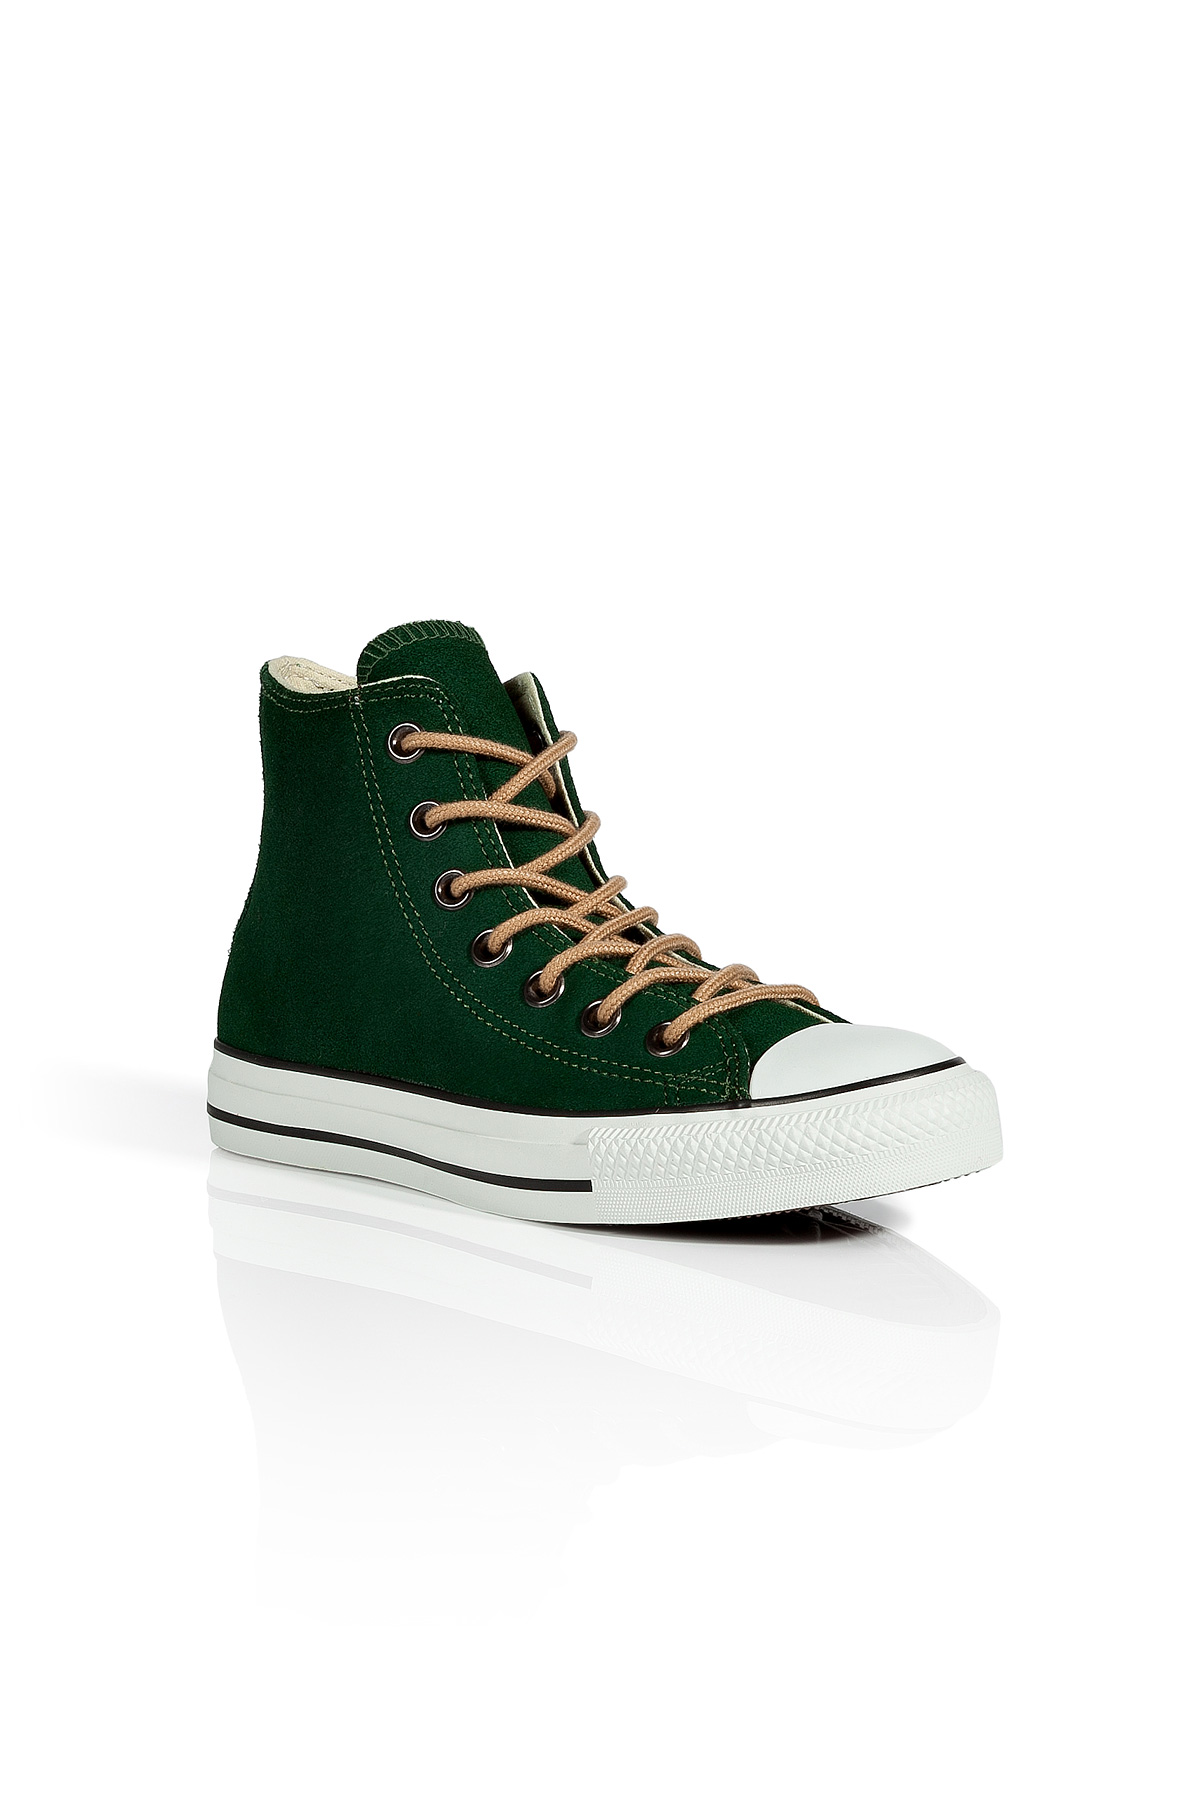 efb701ca541e Lyst - Converse Kombu Green Suede Chuck Tailor Hi Sneakers in Black